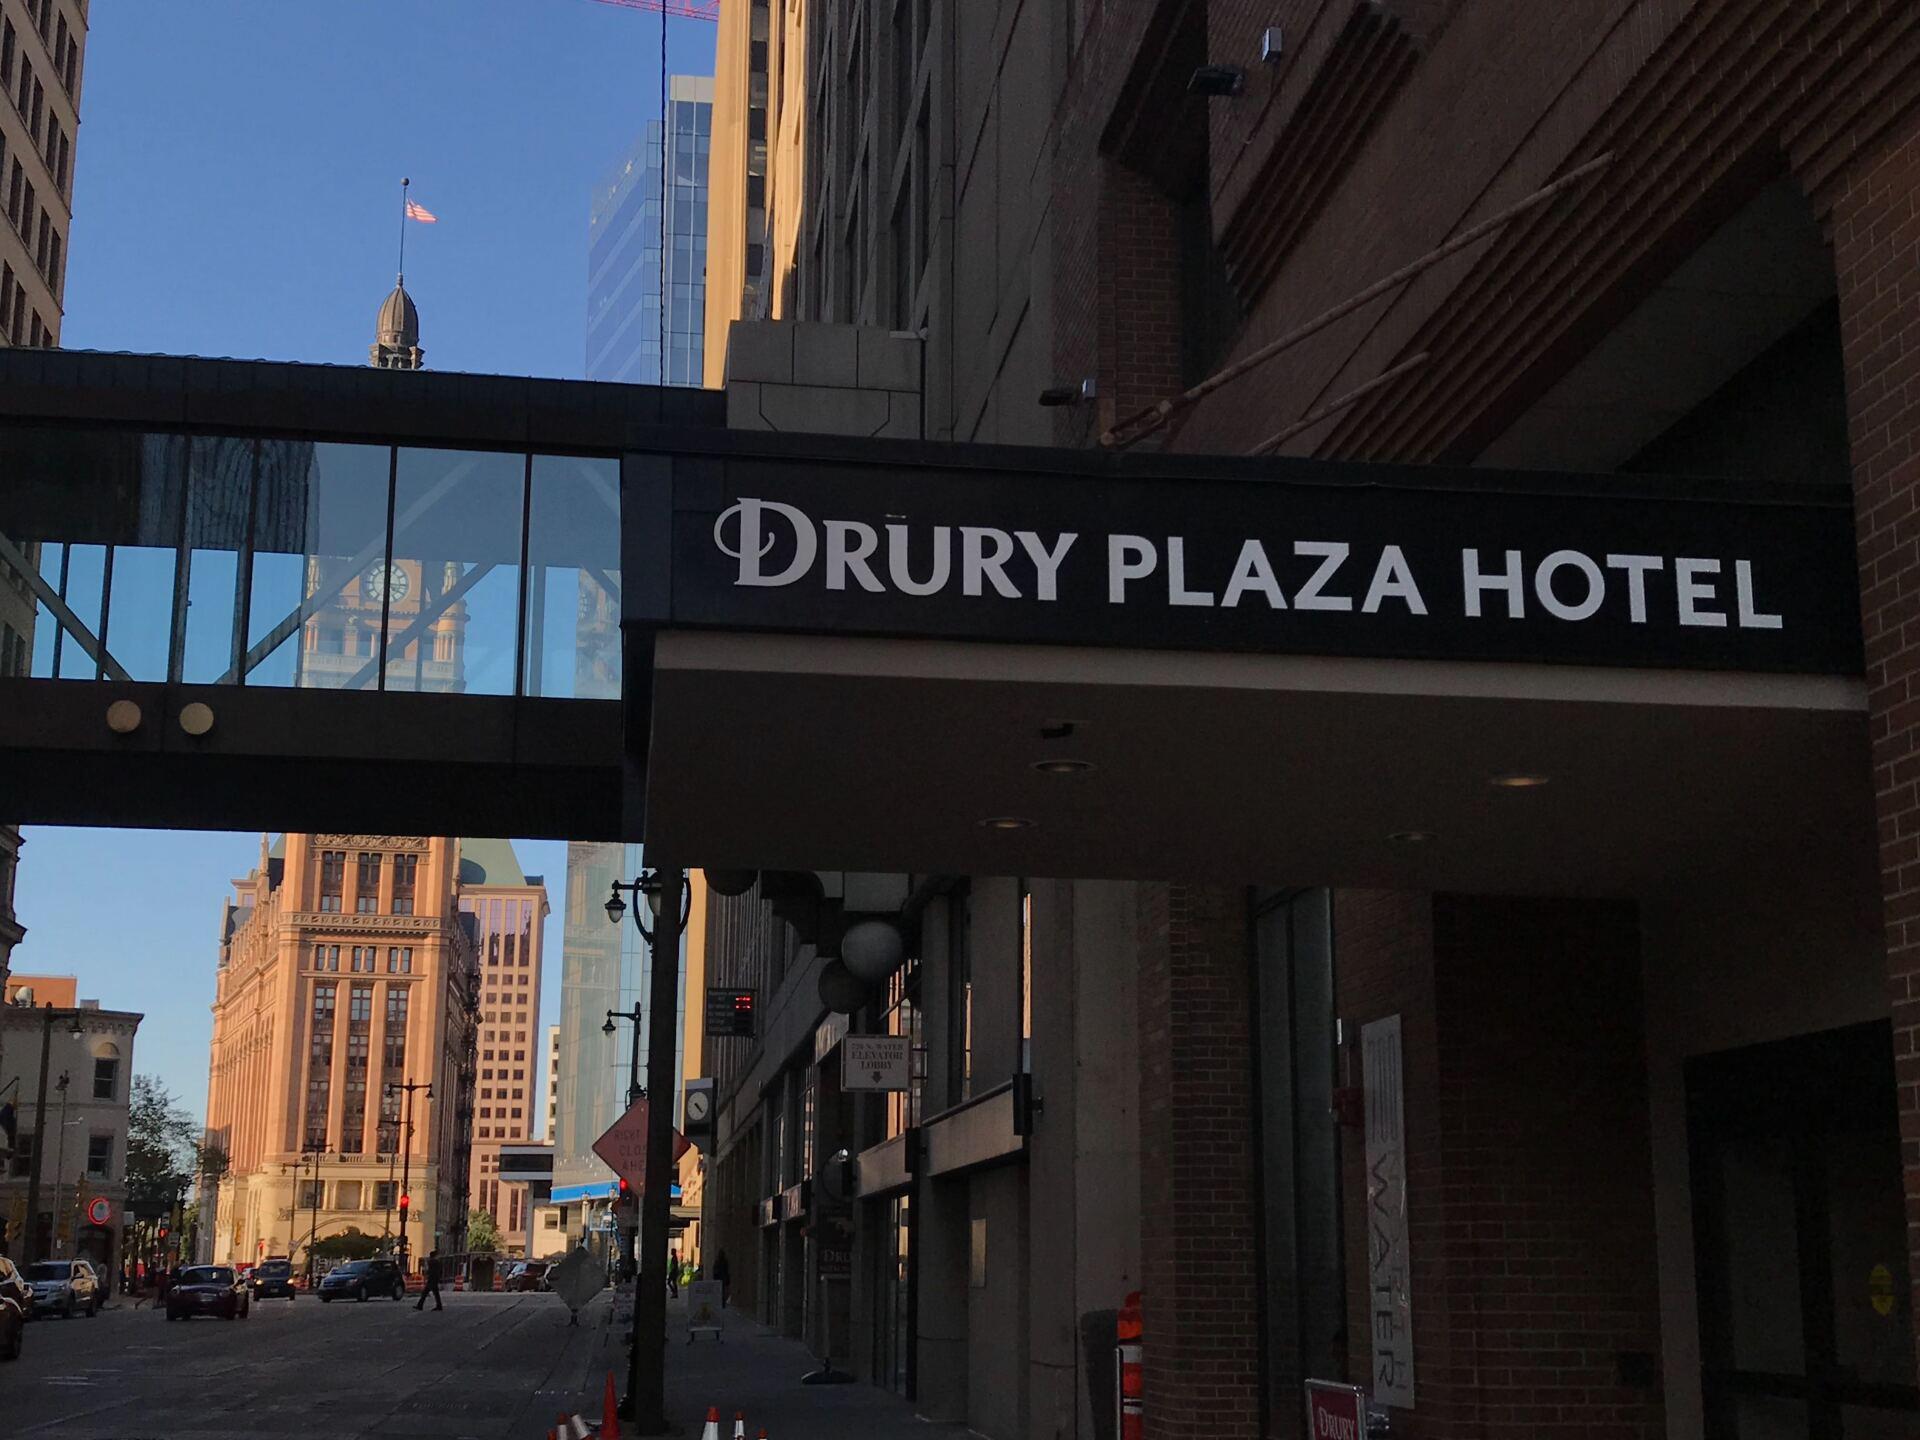 Drury Plaza